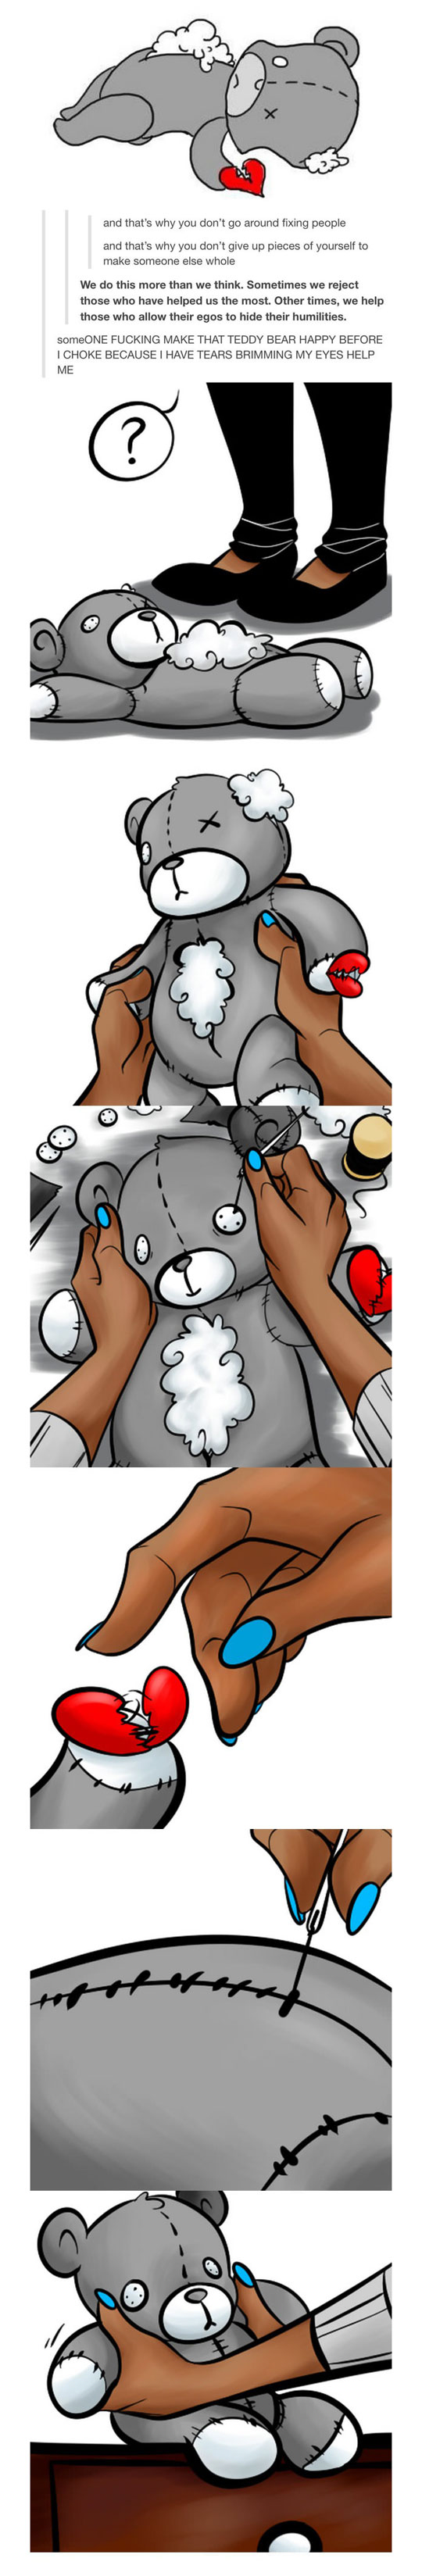 funny-webcomic-bear-fixing-Teddy-human